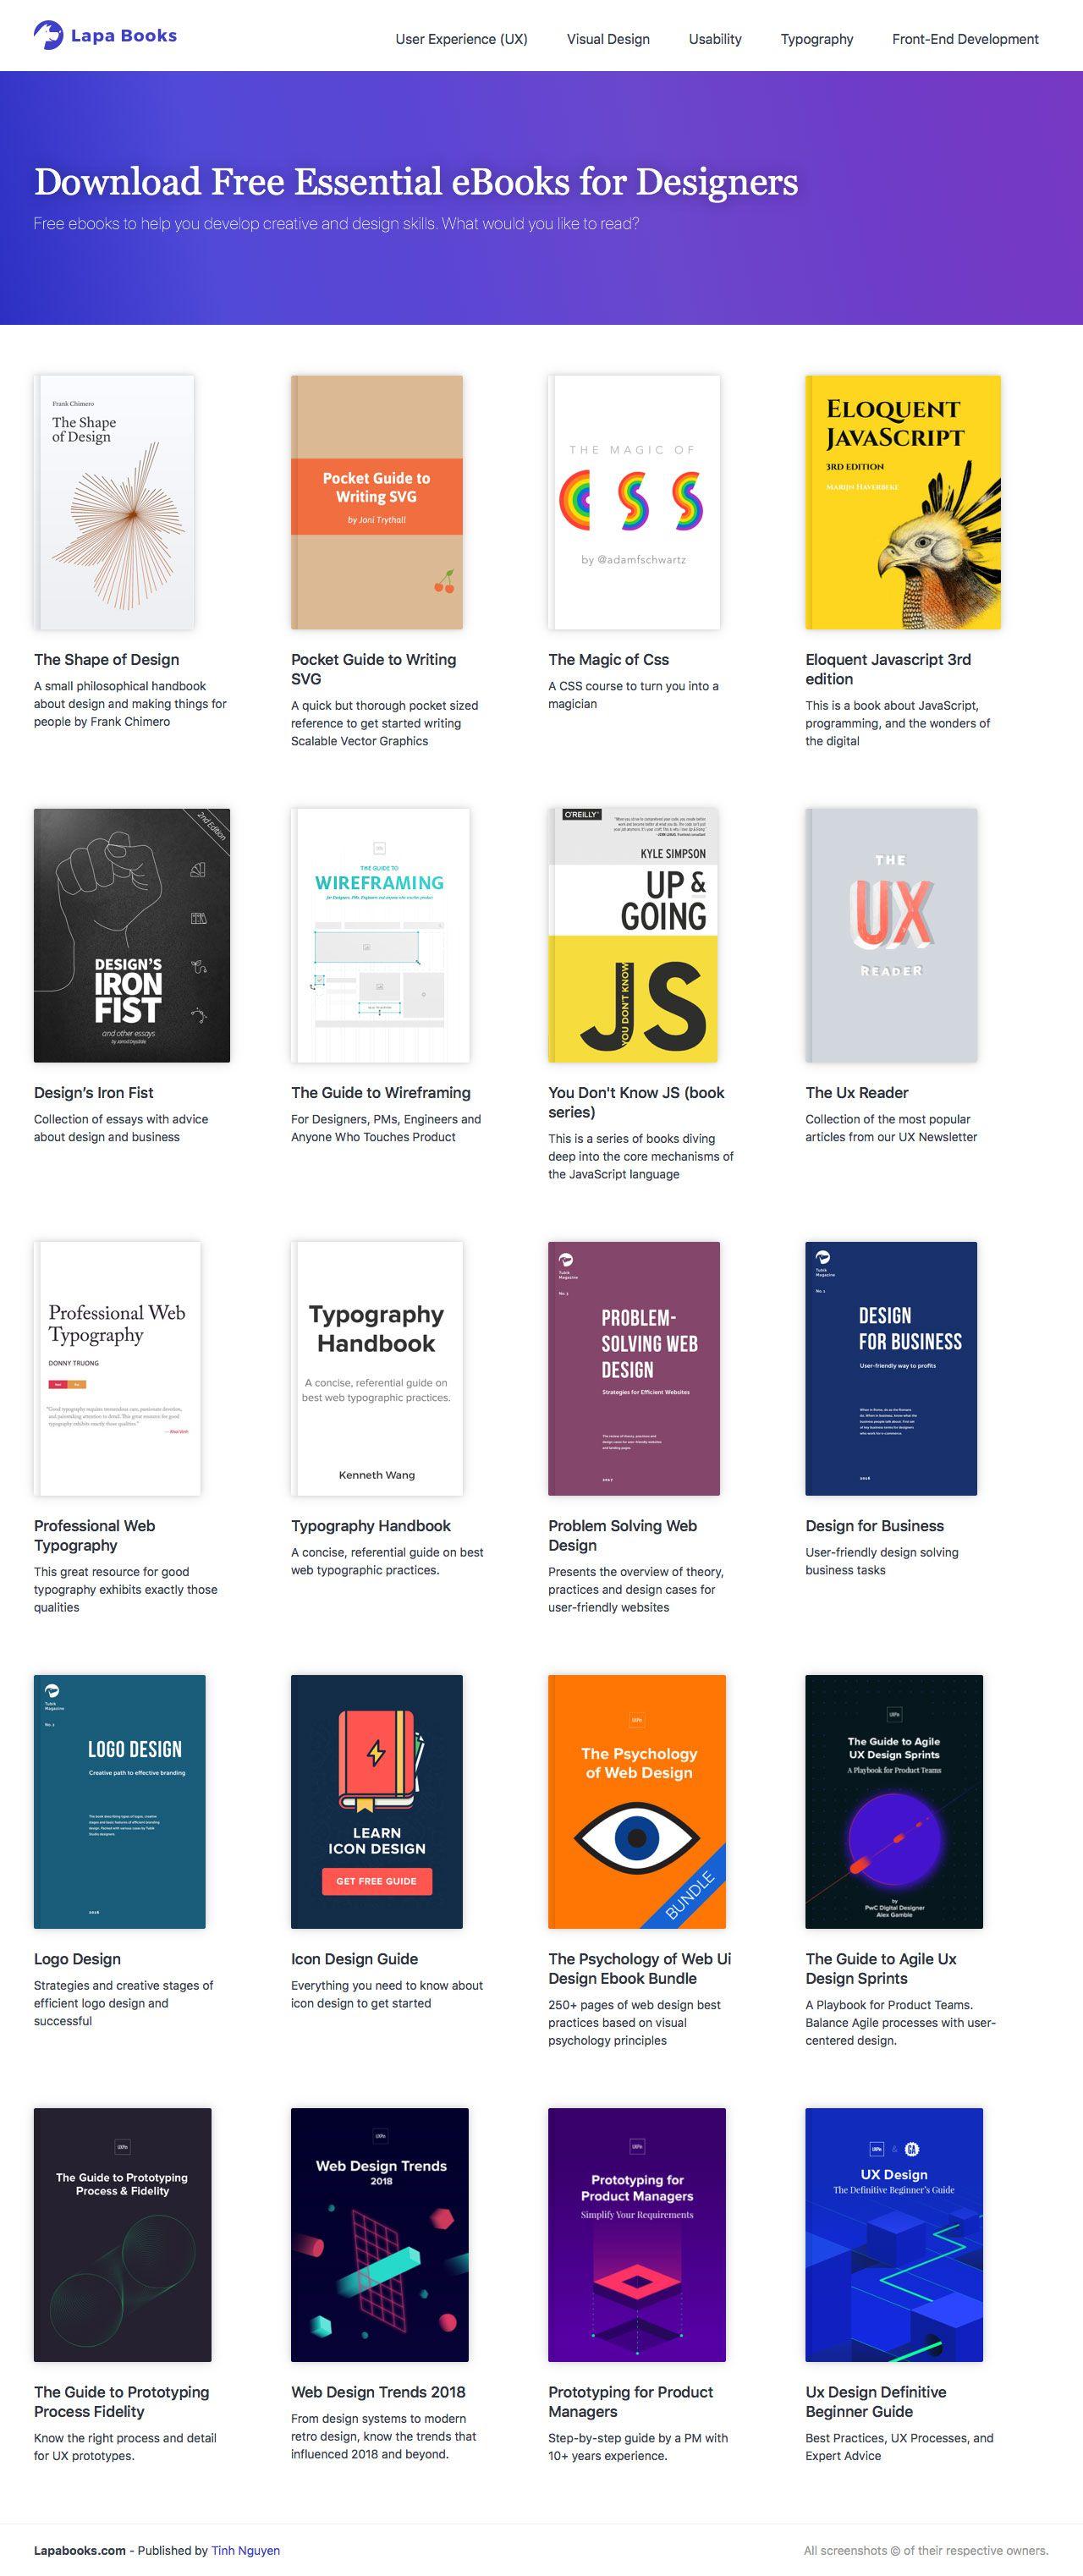 Lapa Books Download Free Essential Ebooks For Designers Landing Page Design Page Design Best Landing Page Design